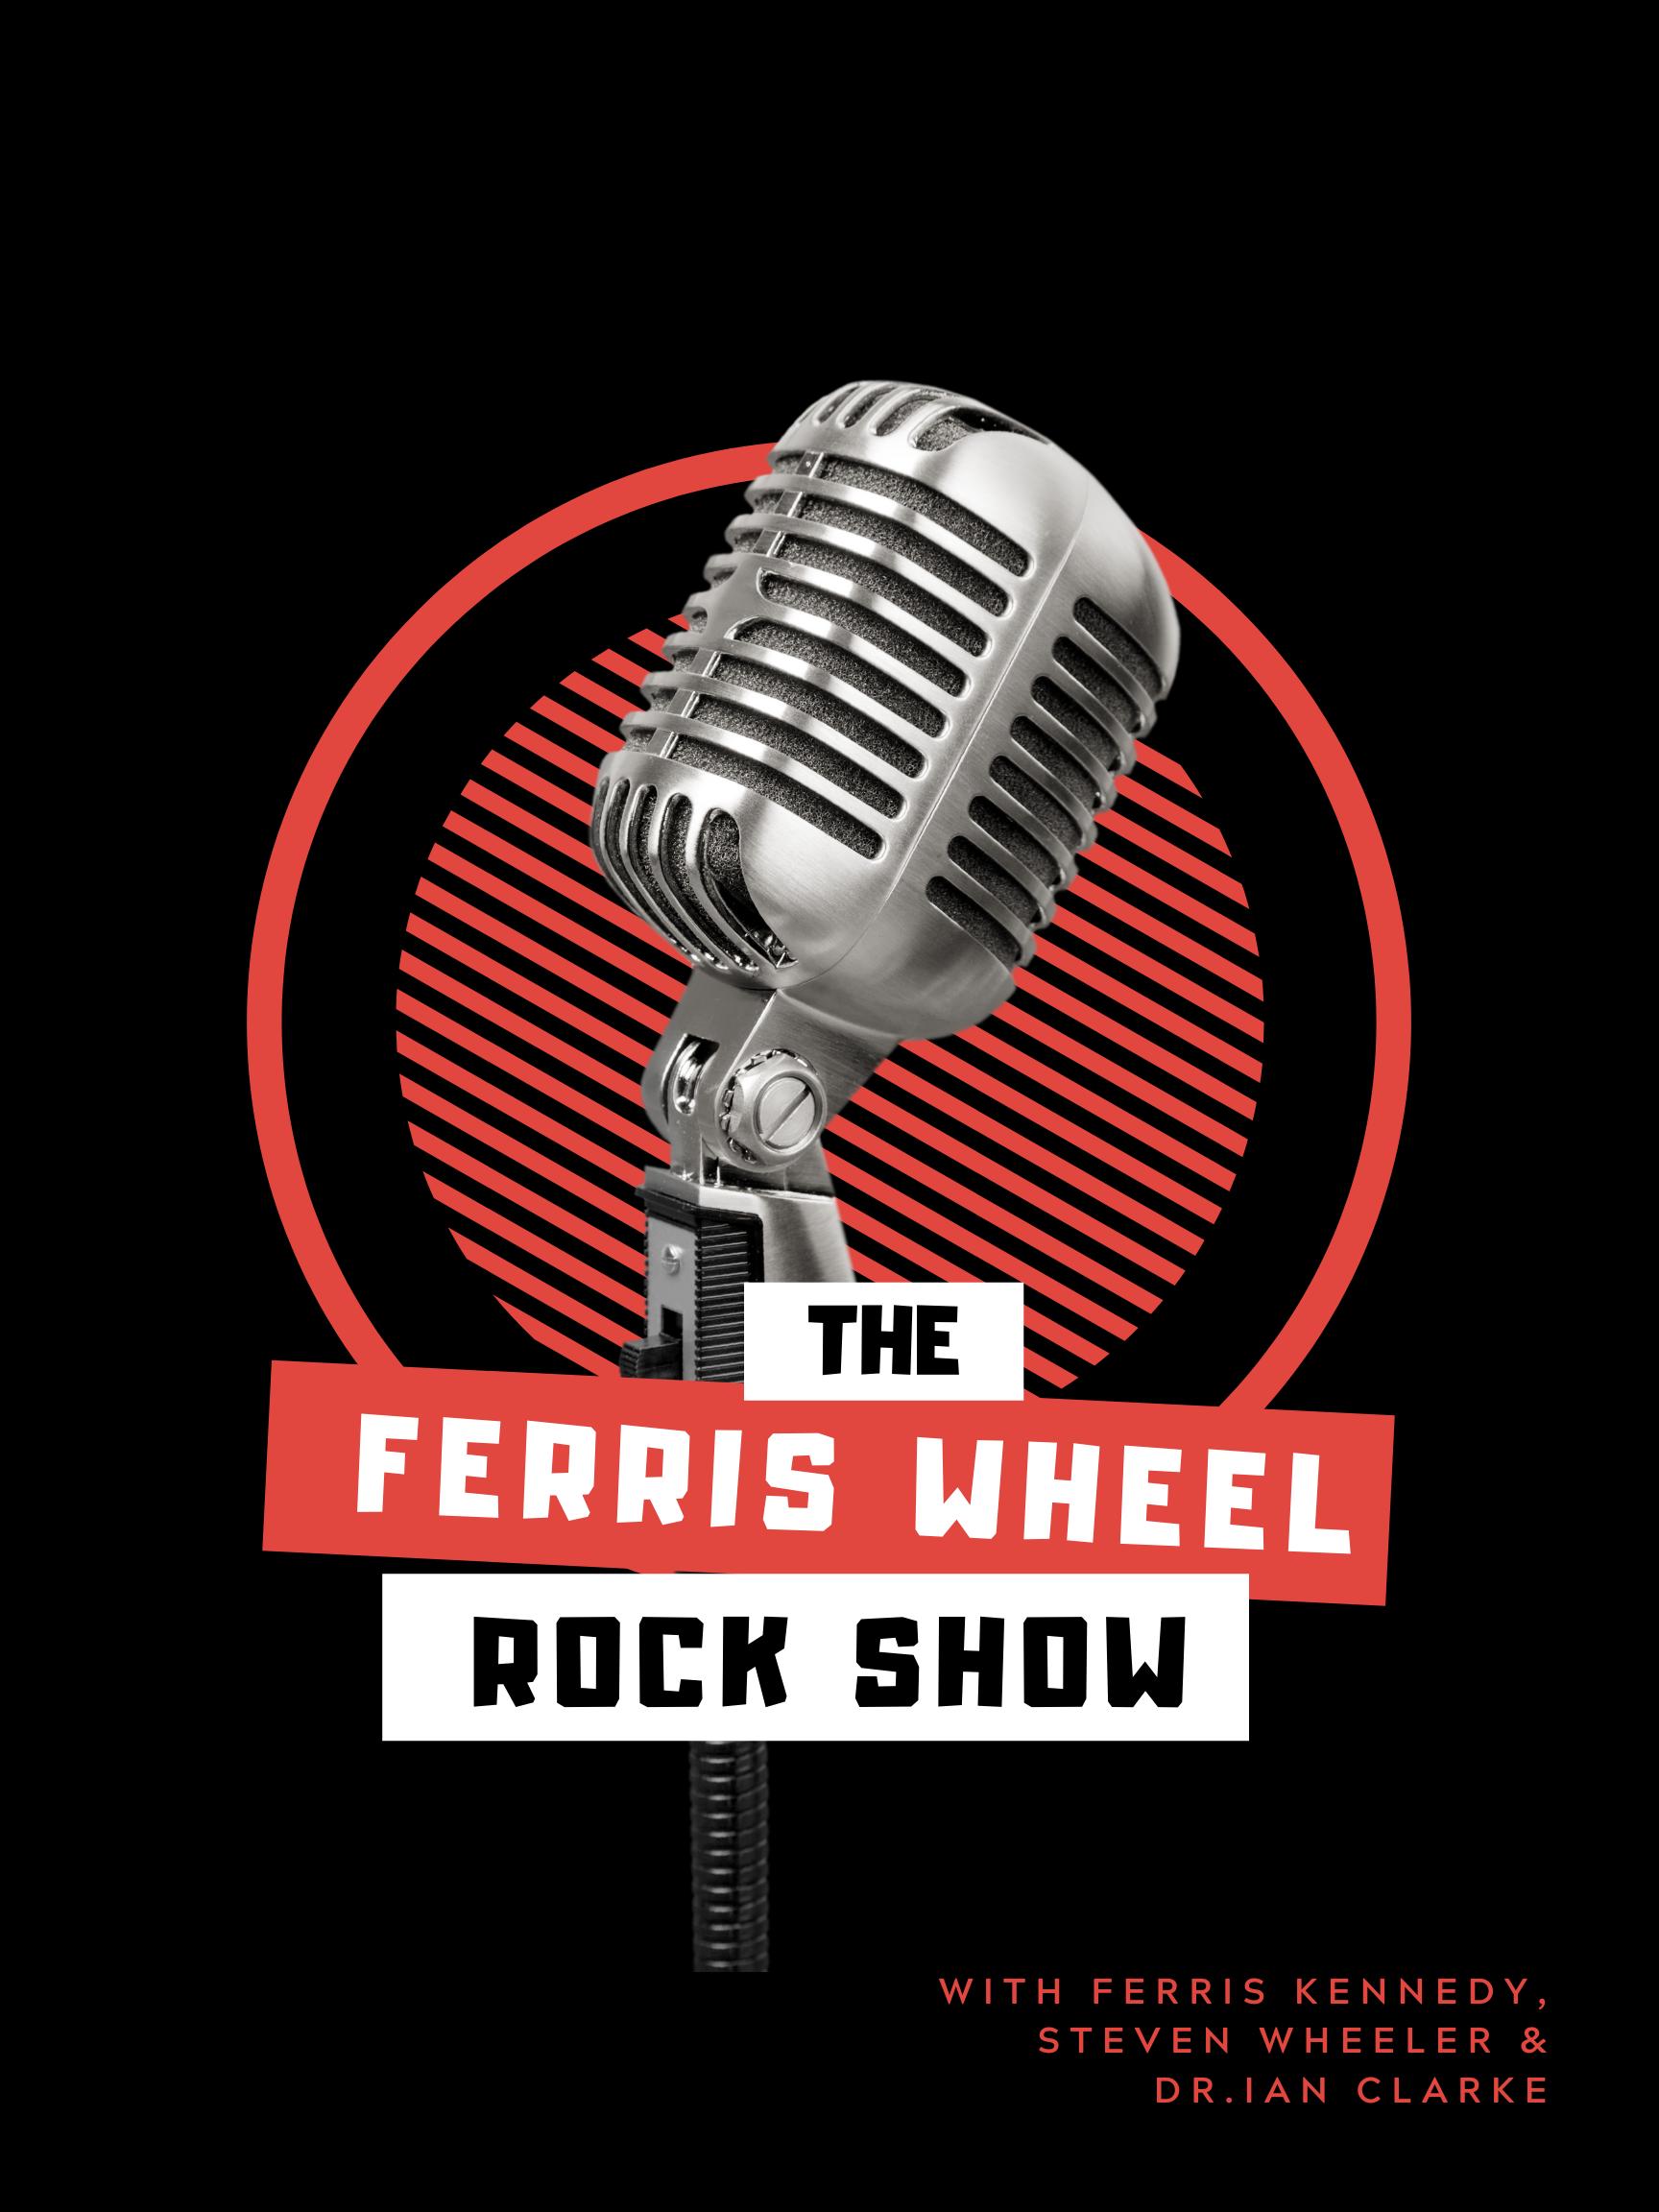 The Ferris Wheel Classic Rock Show show art